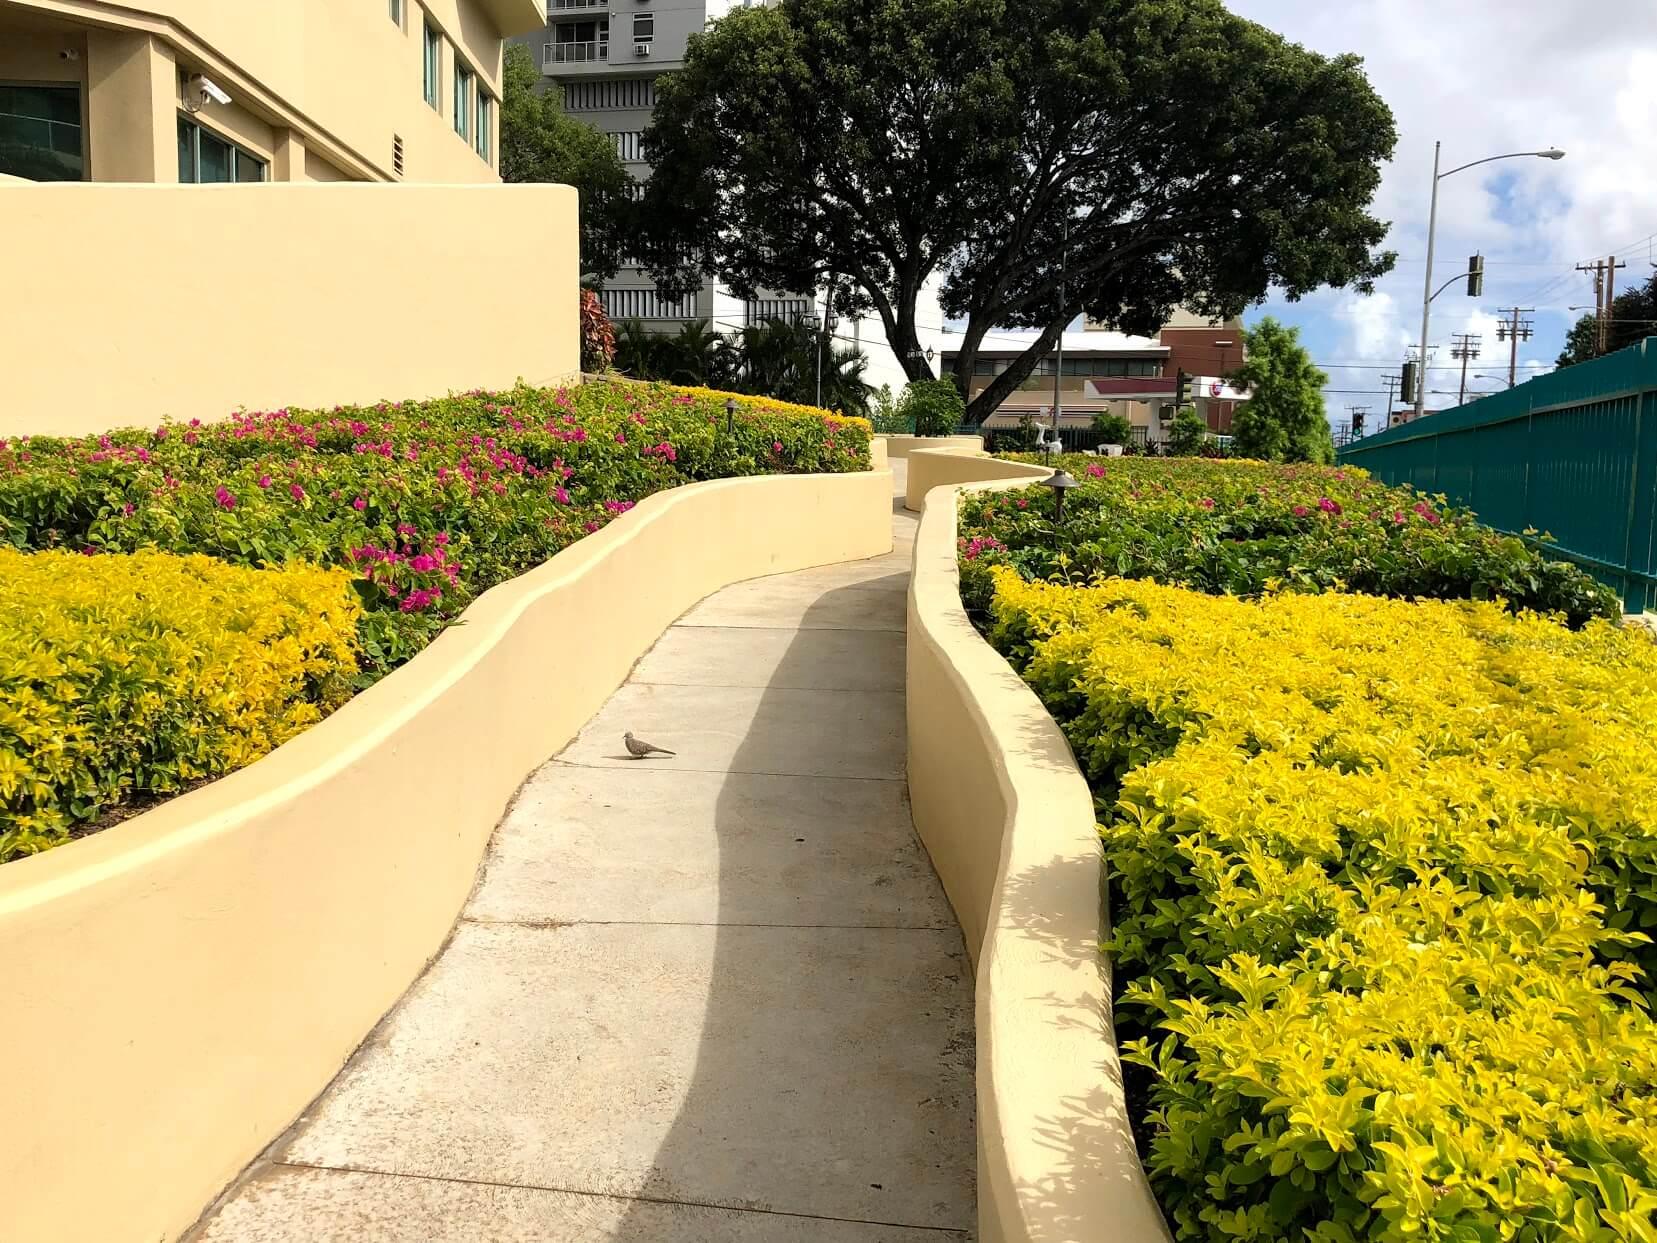 One Kalakauaの歩道